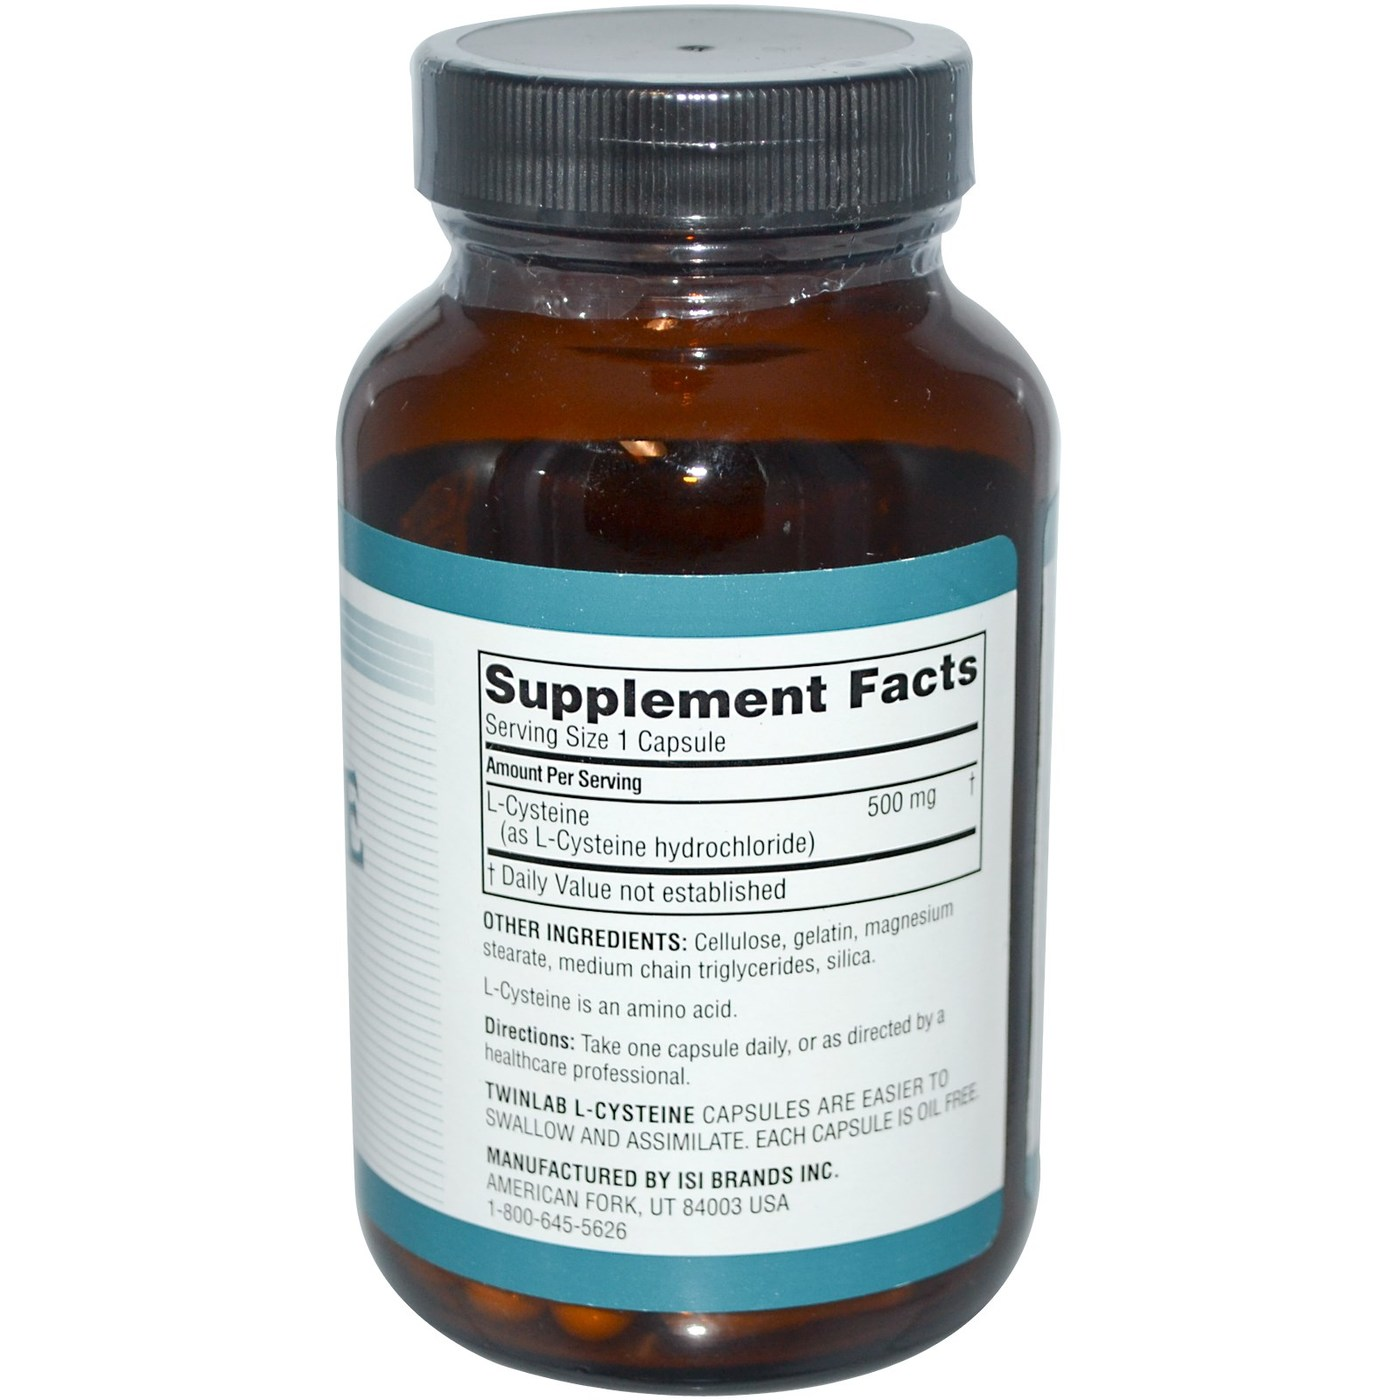 Twinlab L-Cysteine - 500 mg - 60 Capsules - eVitamins.com